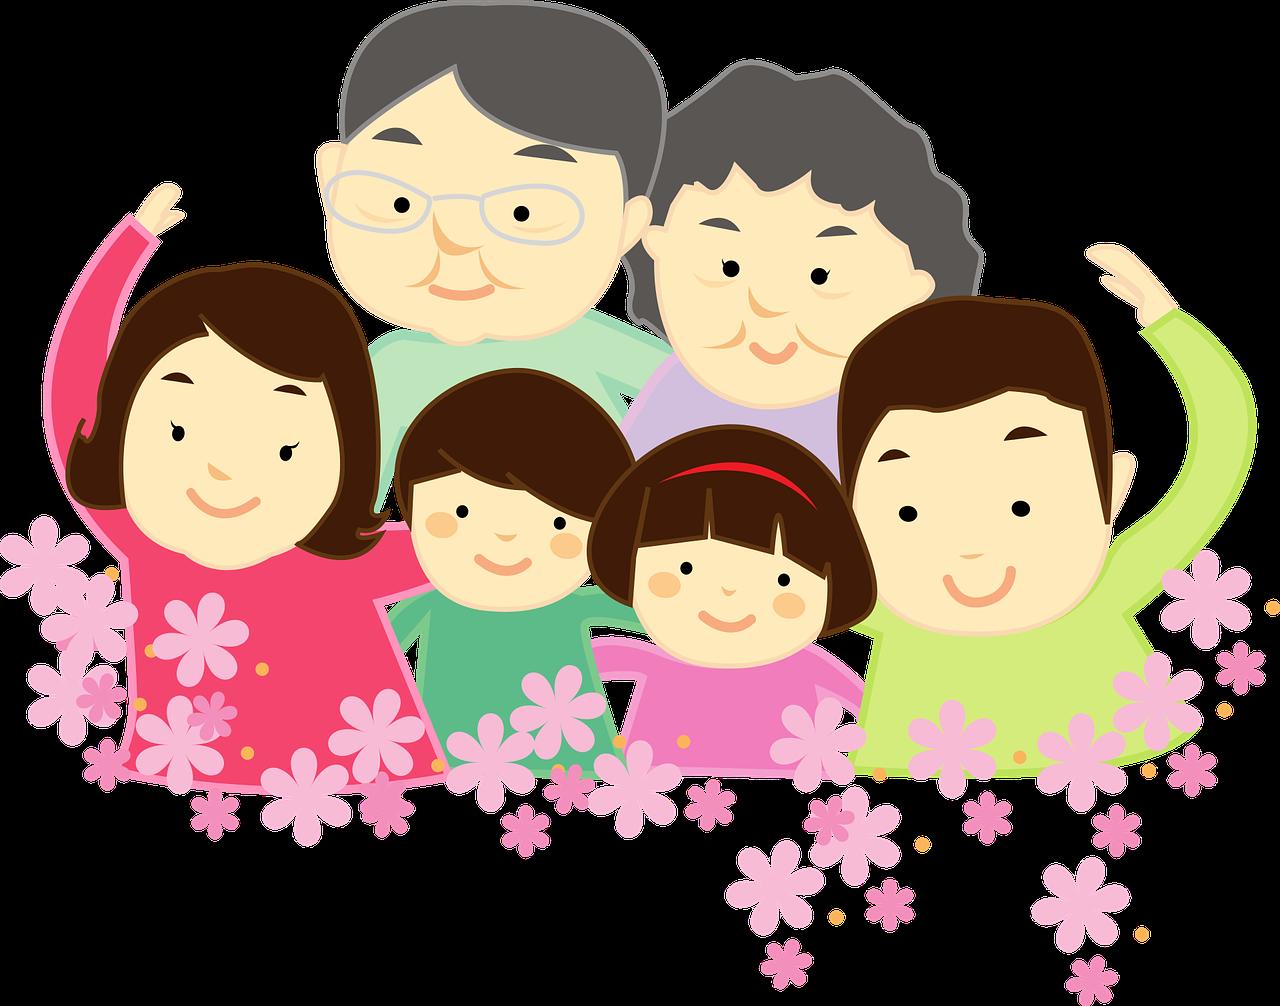 family-1976162_1280